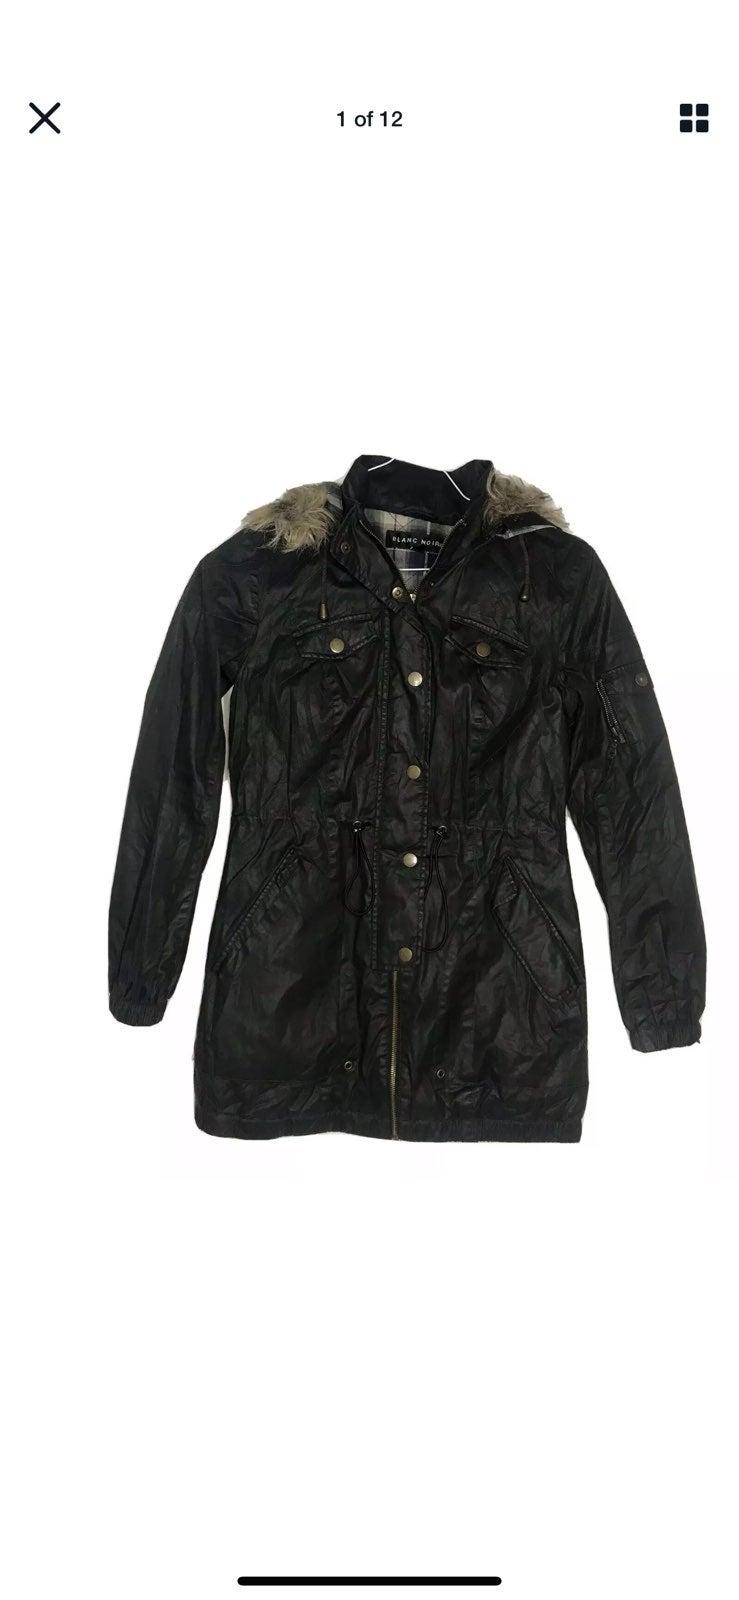 Blanc Noir Women Small Jacket Coat Quilt